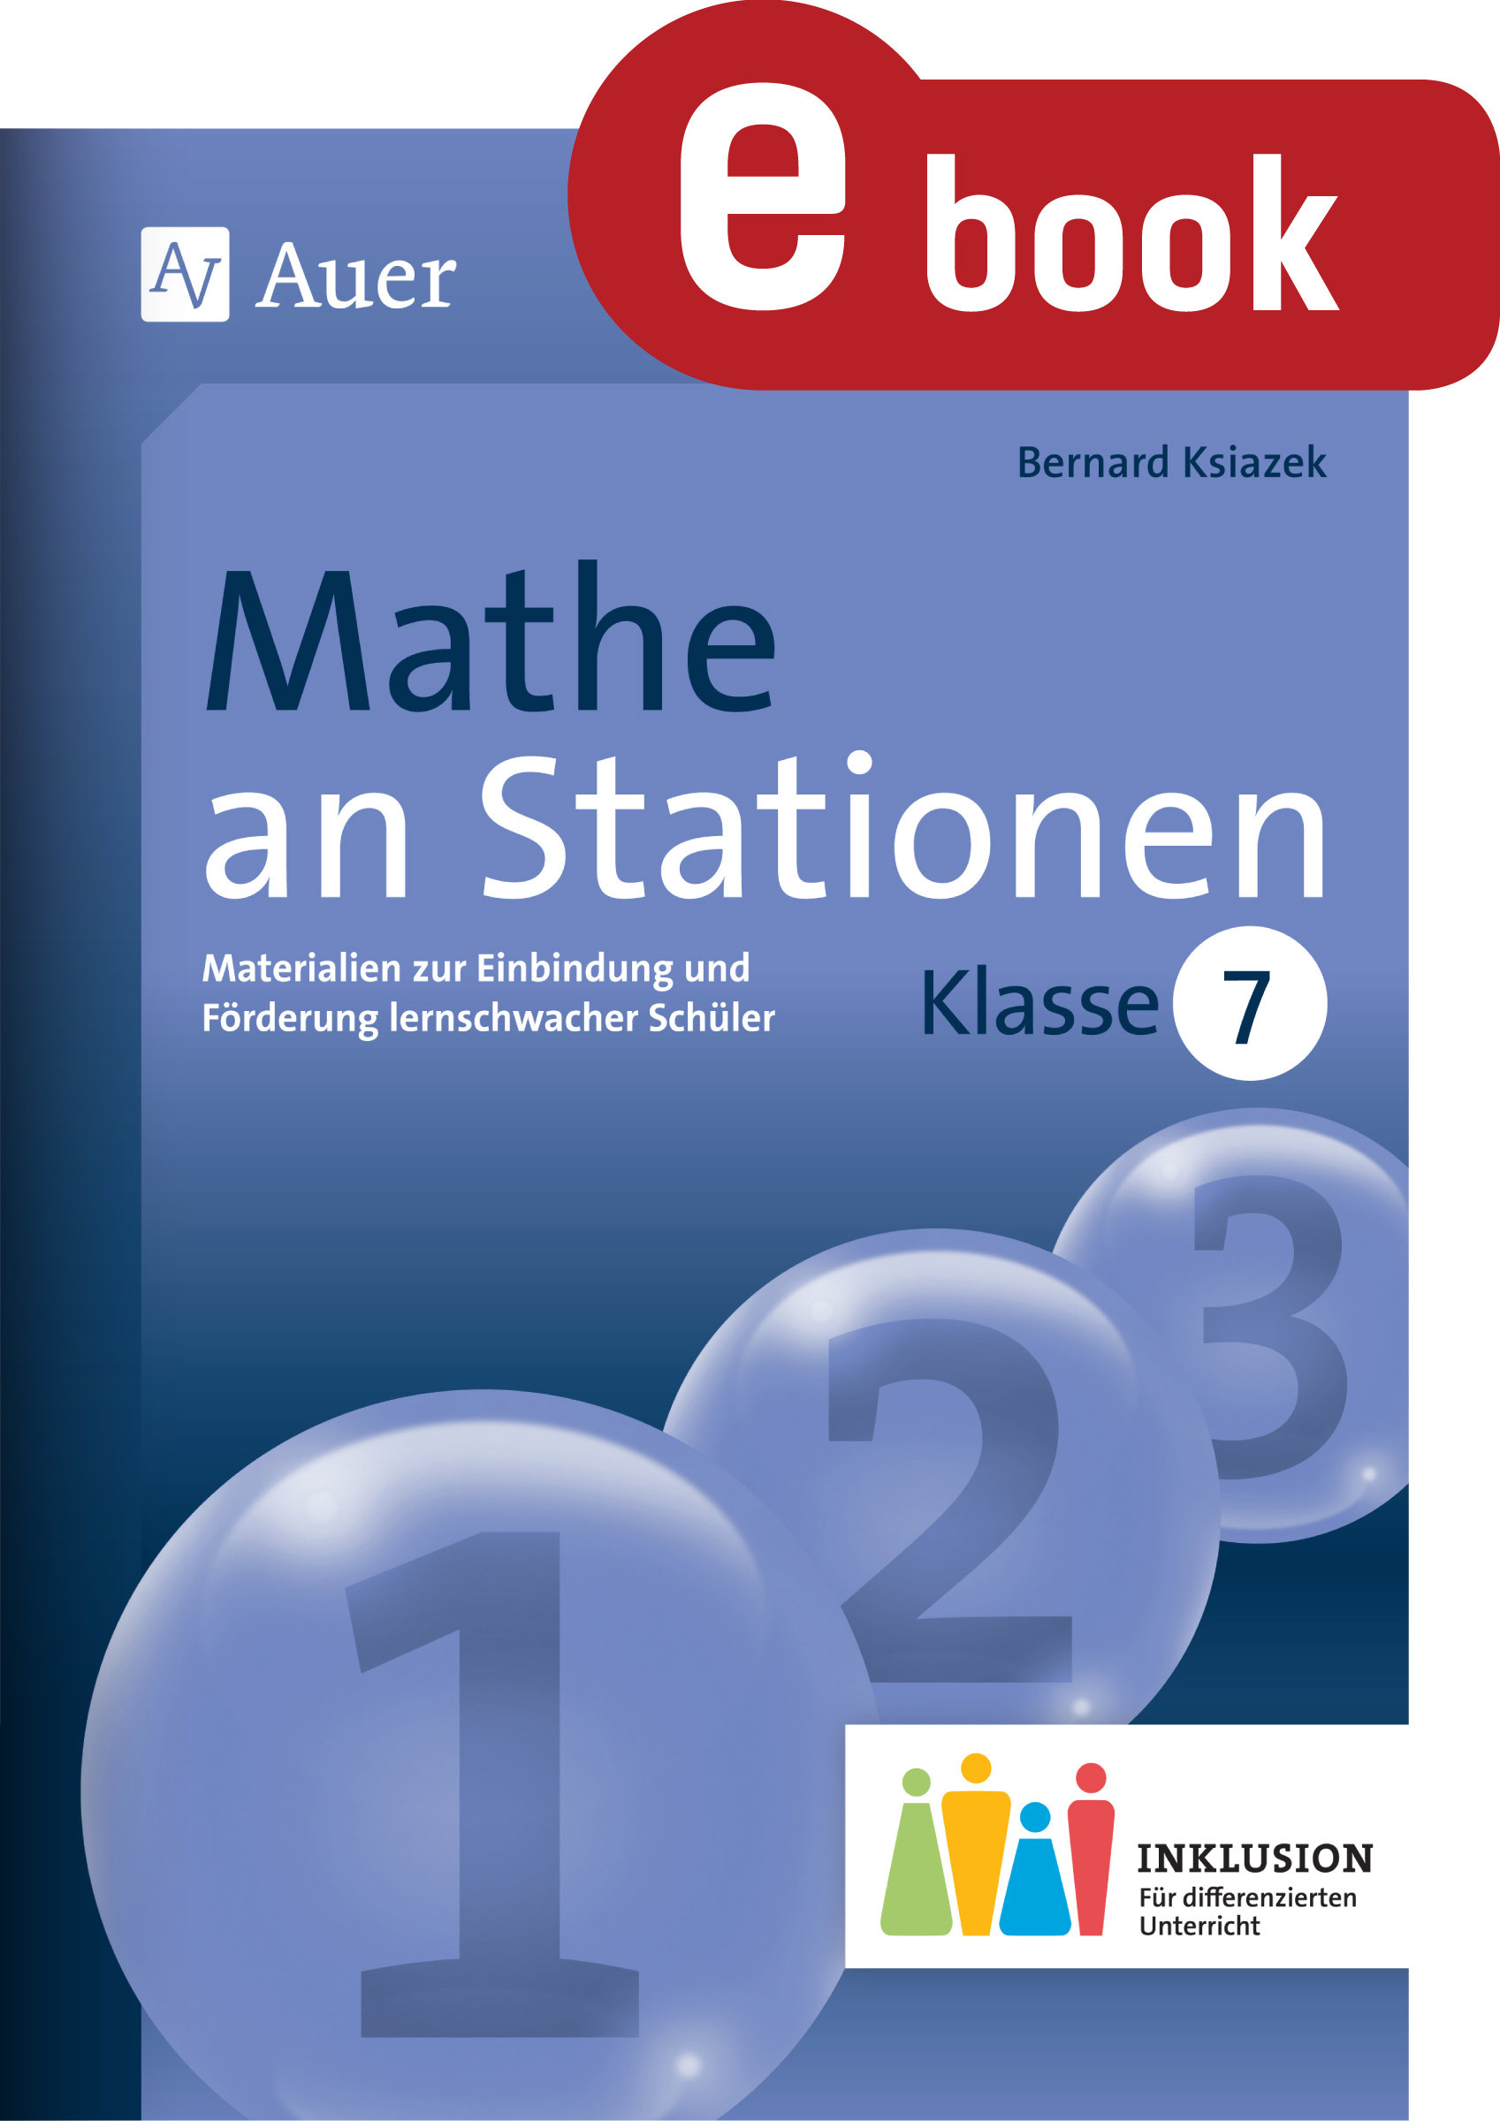 Mathe an Stationen 7 Inklusion - PDF eBook kaufen   Ebooks ...